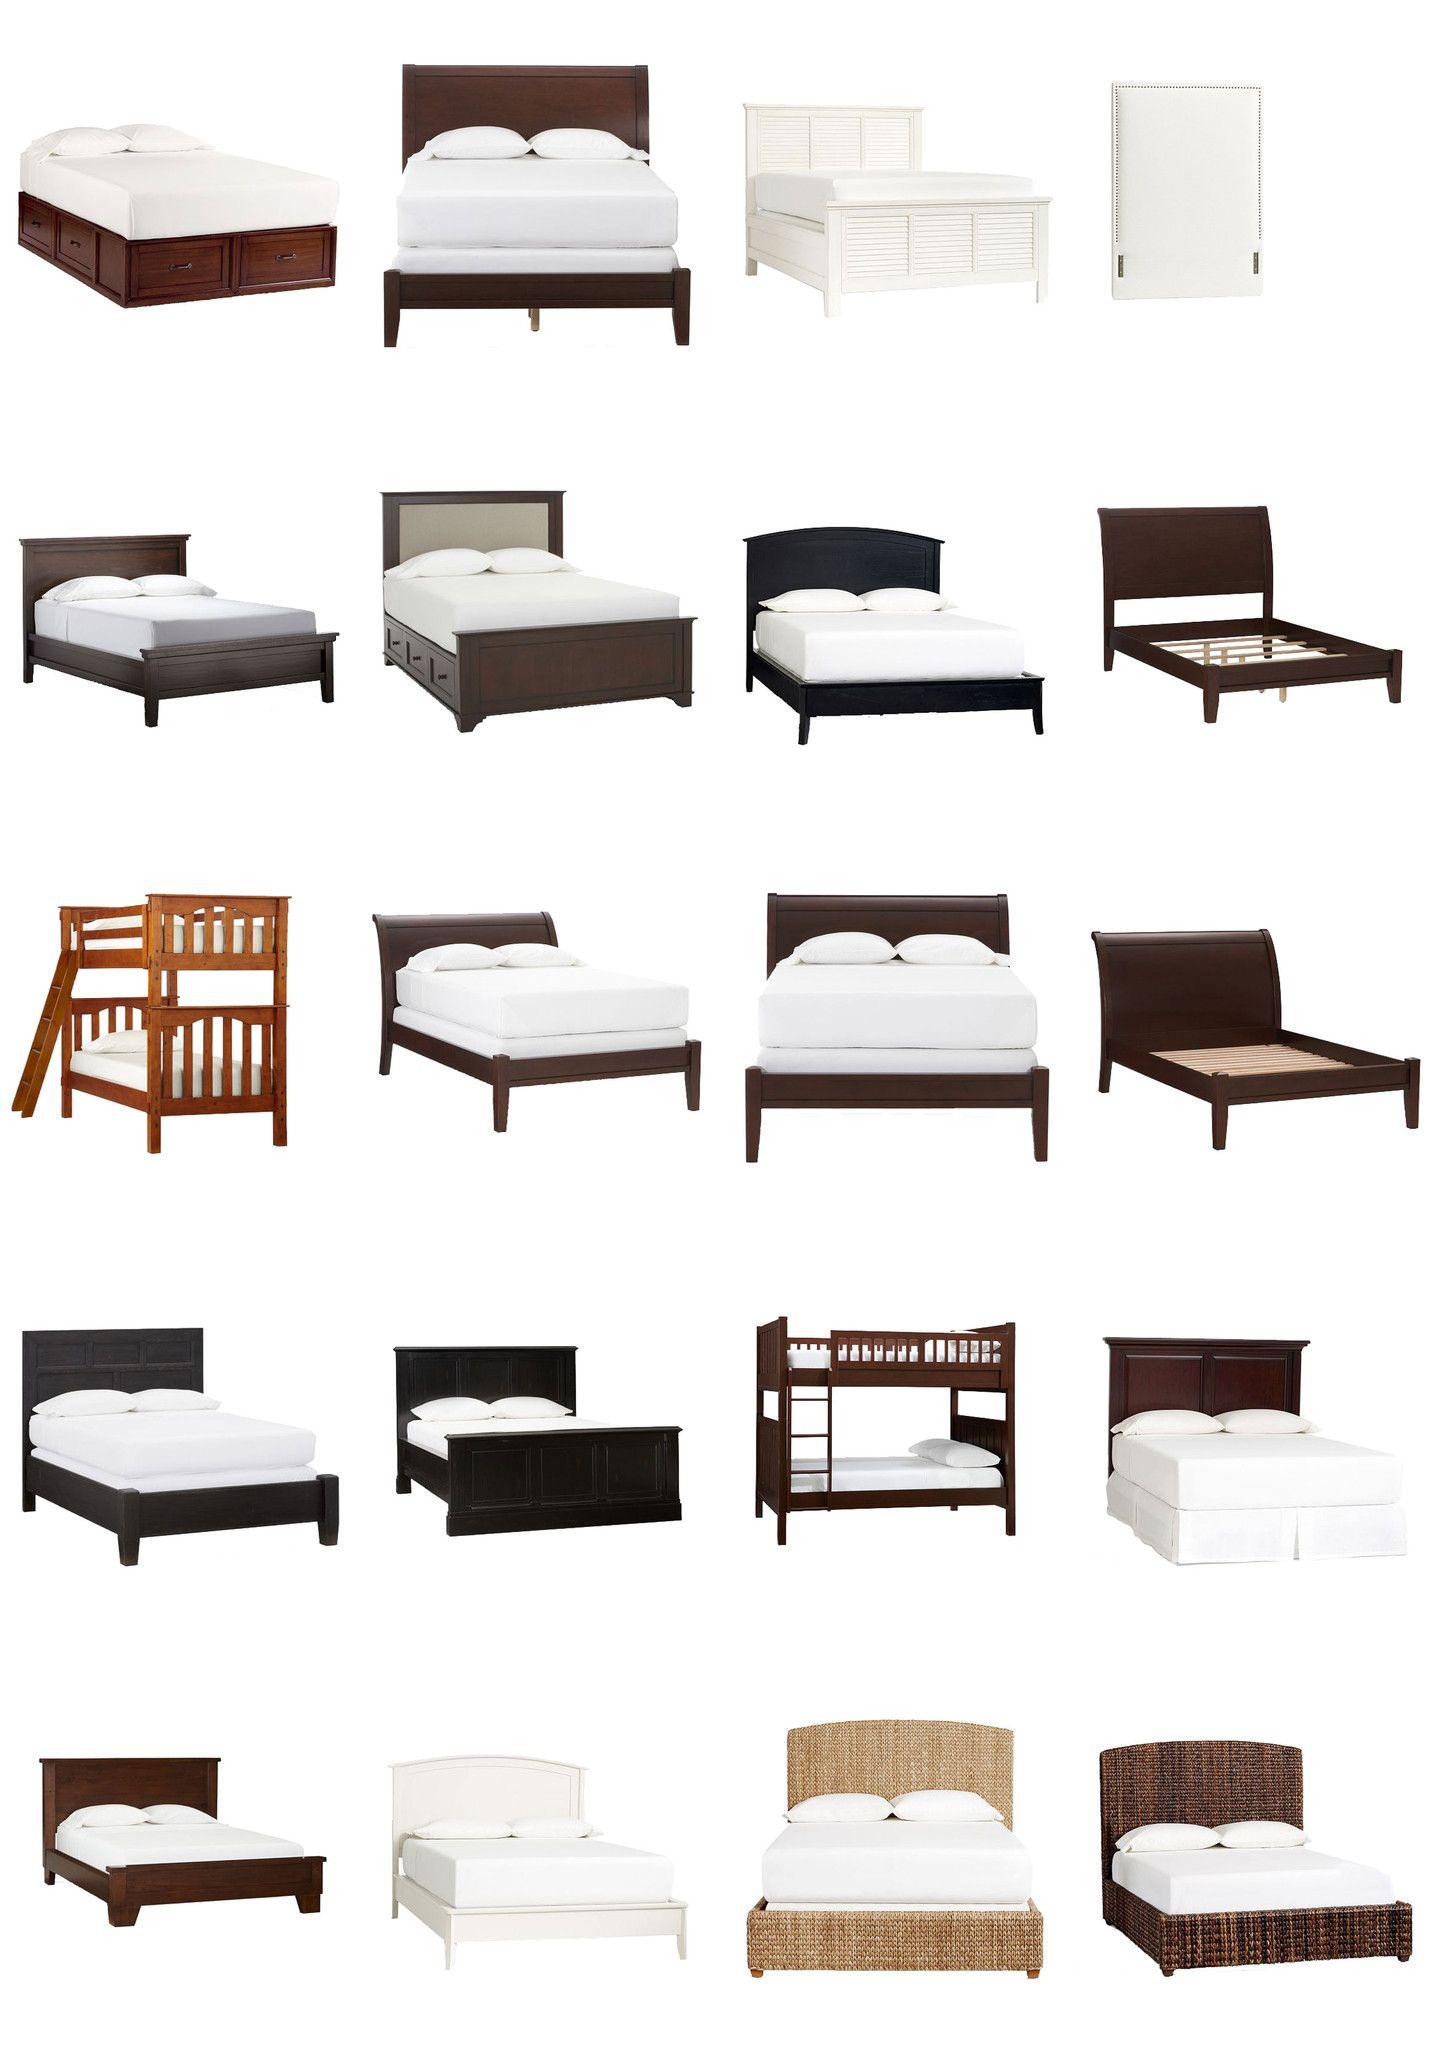 Bedroom Chair Cad Block Modern Rocking Nursery Uk Photoshop Psd Bed Blocks V1  Design Free